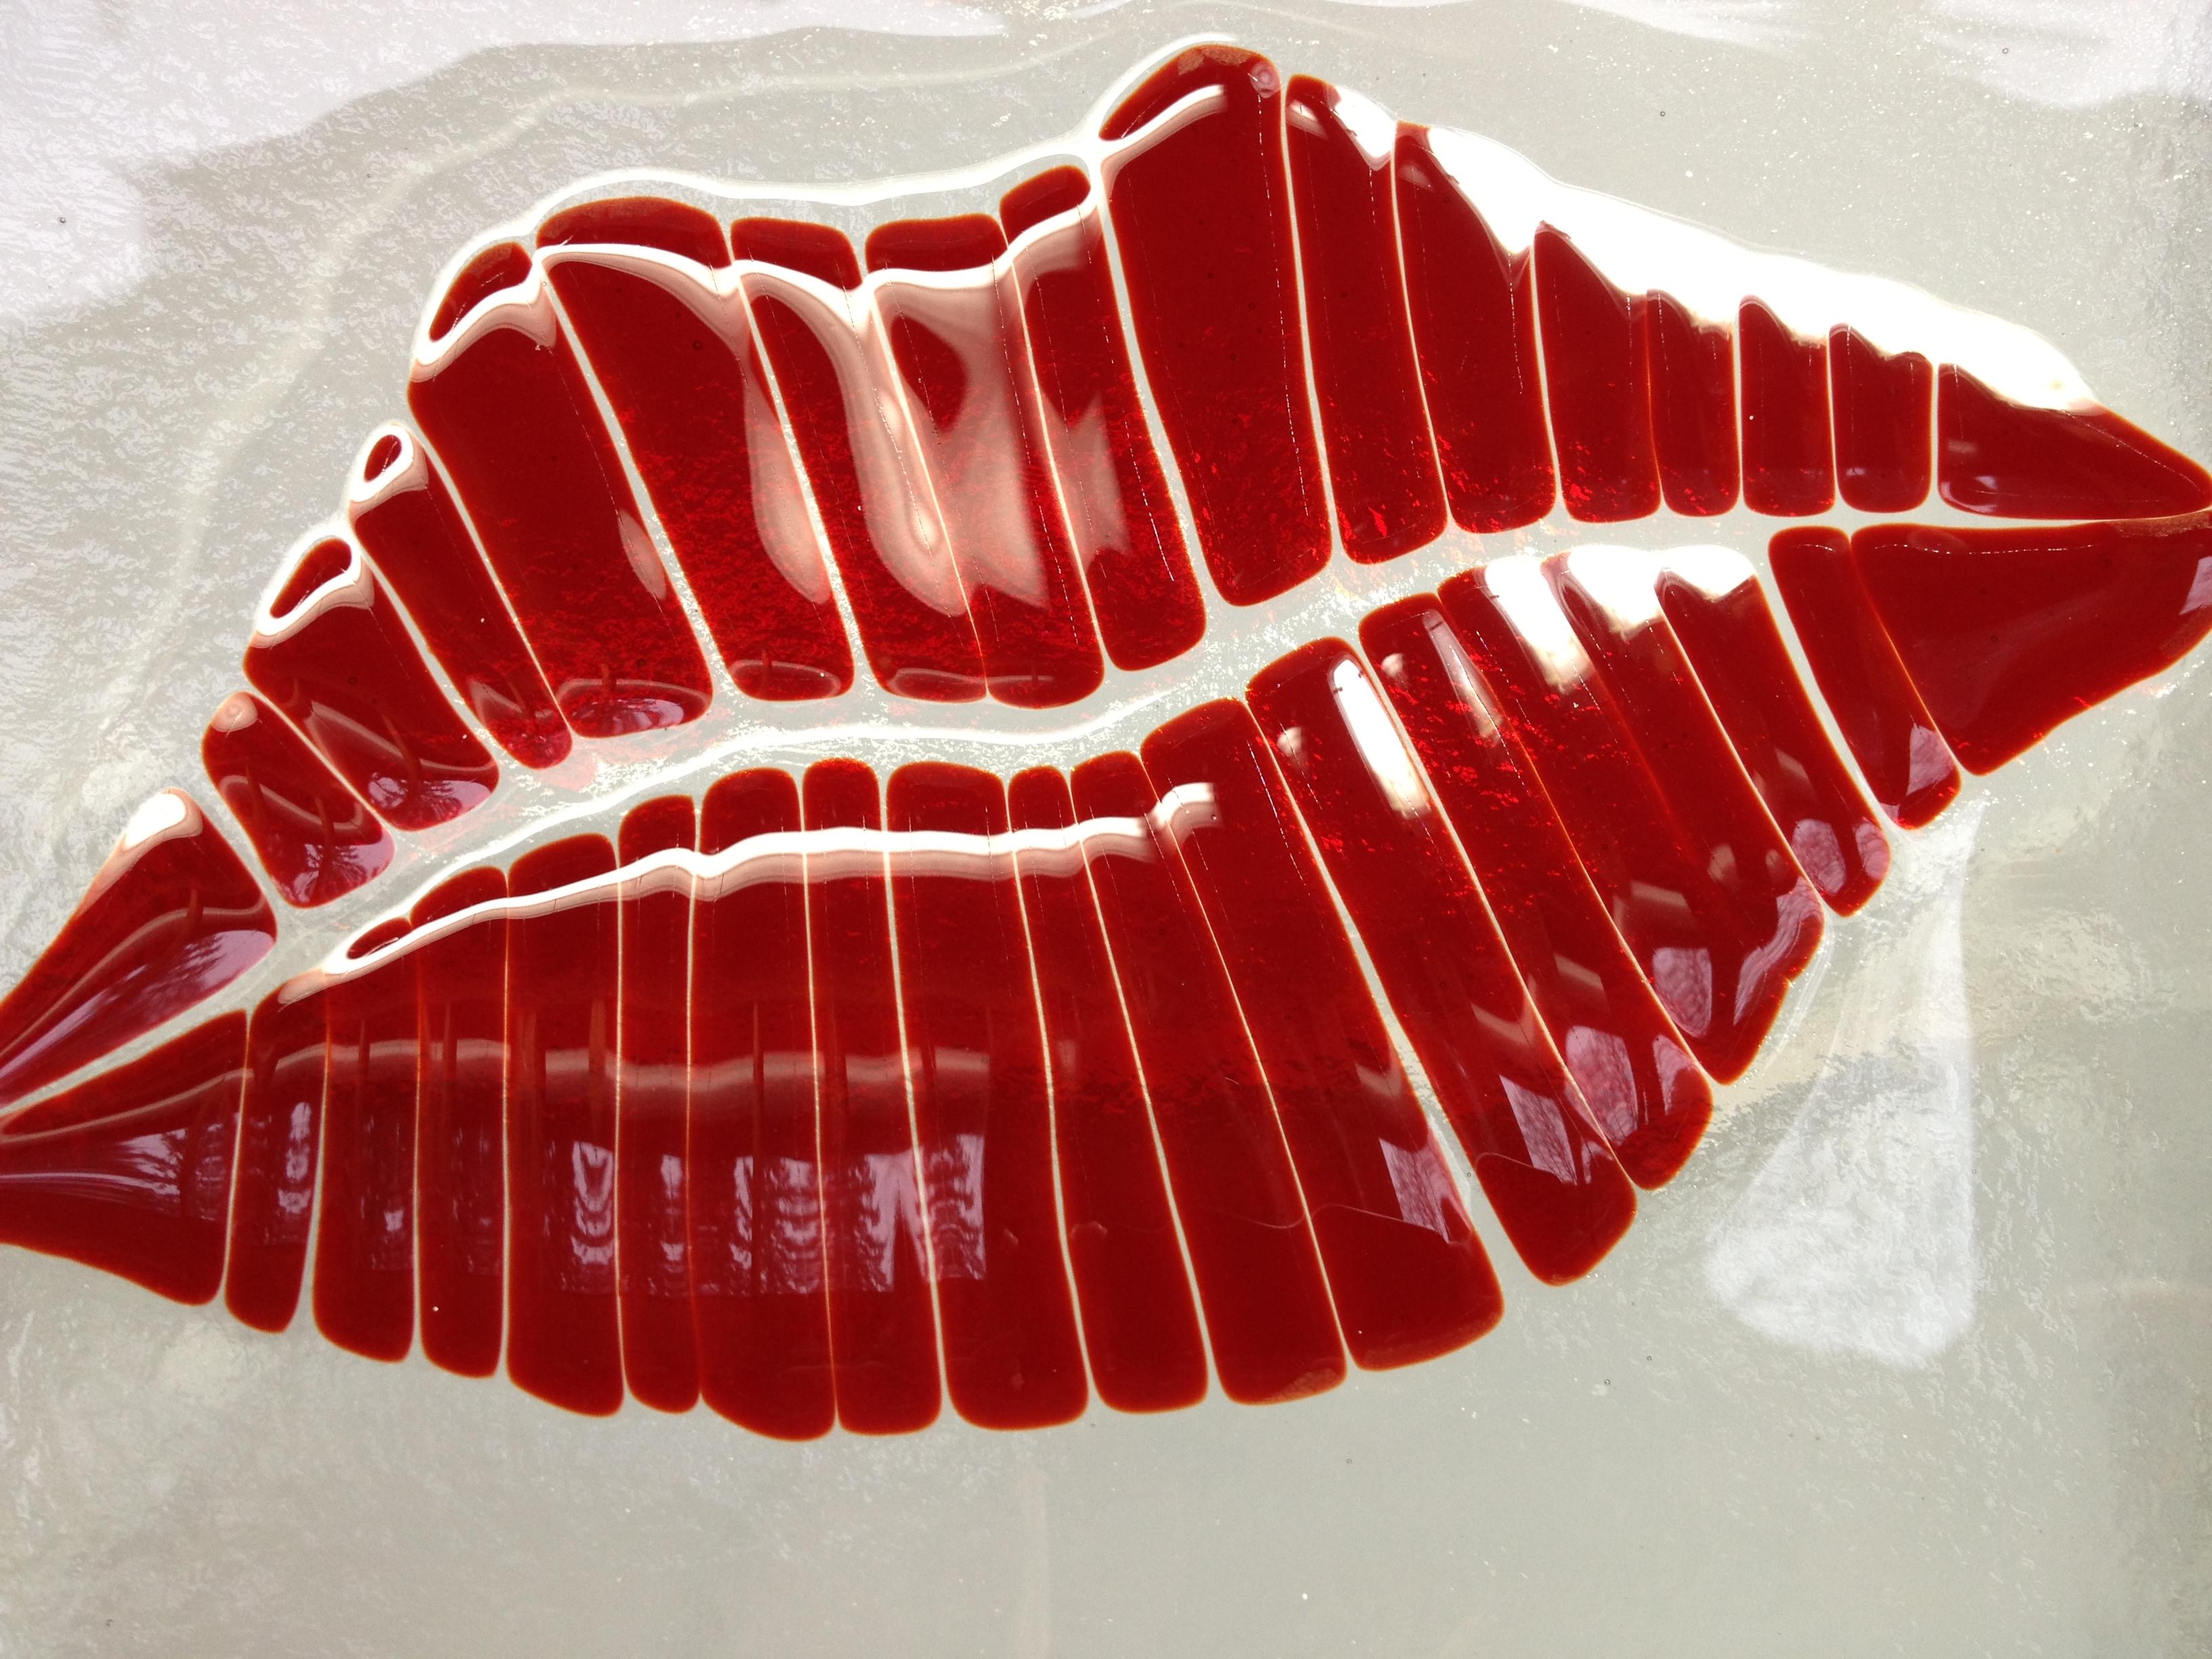 plate, lips